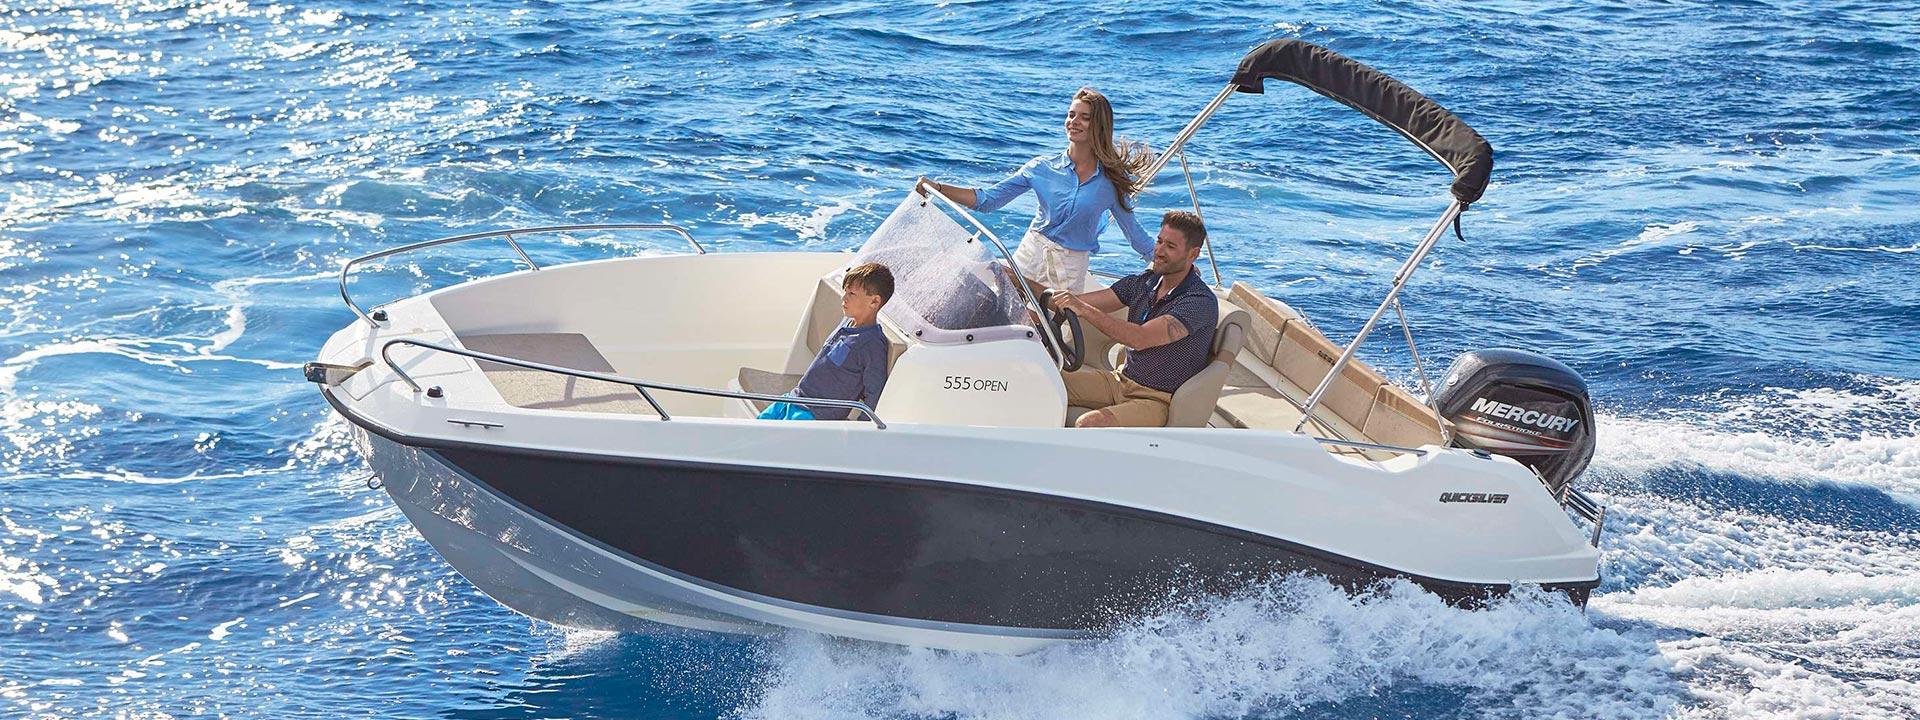 mayer-charter-boat-header-quicksilver-activ-555-open-01